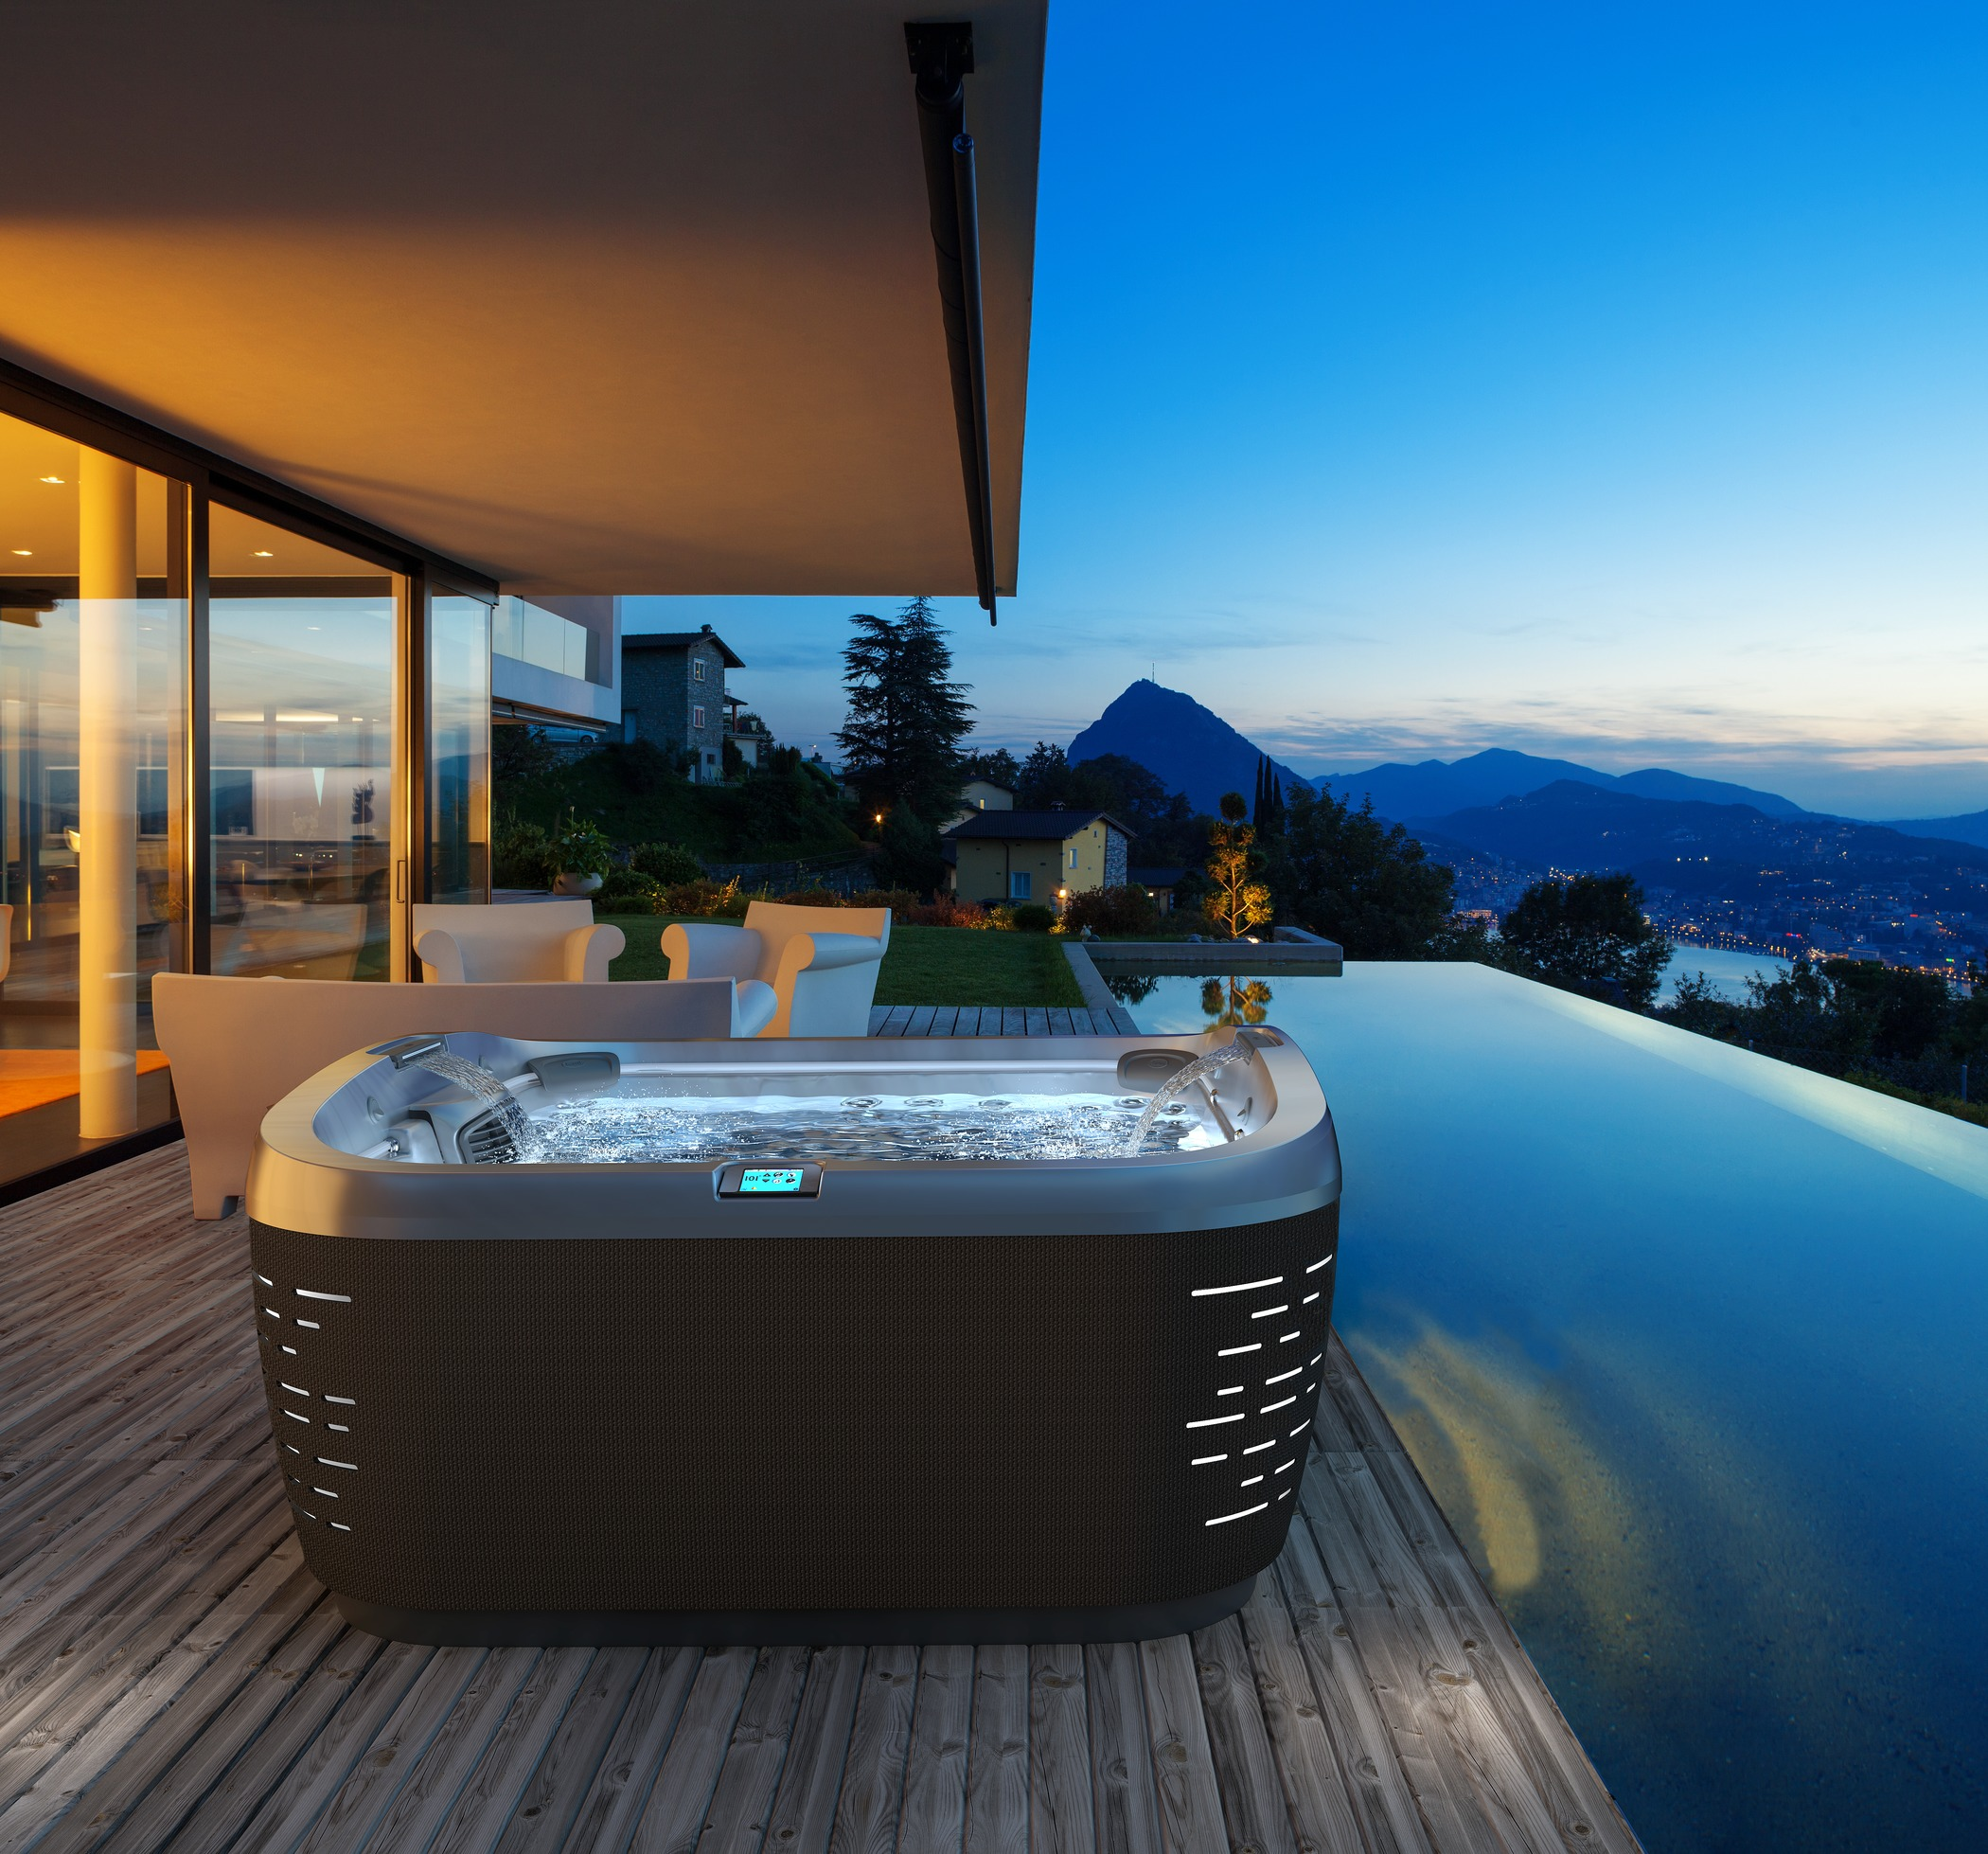 J-585 hot tub next to infinity pool at night